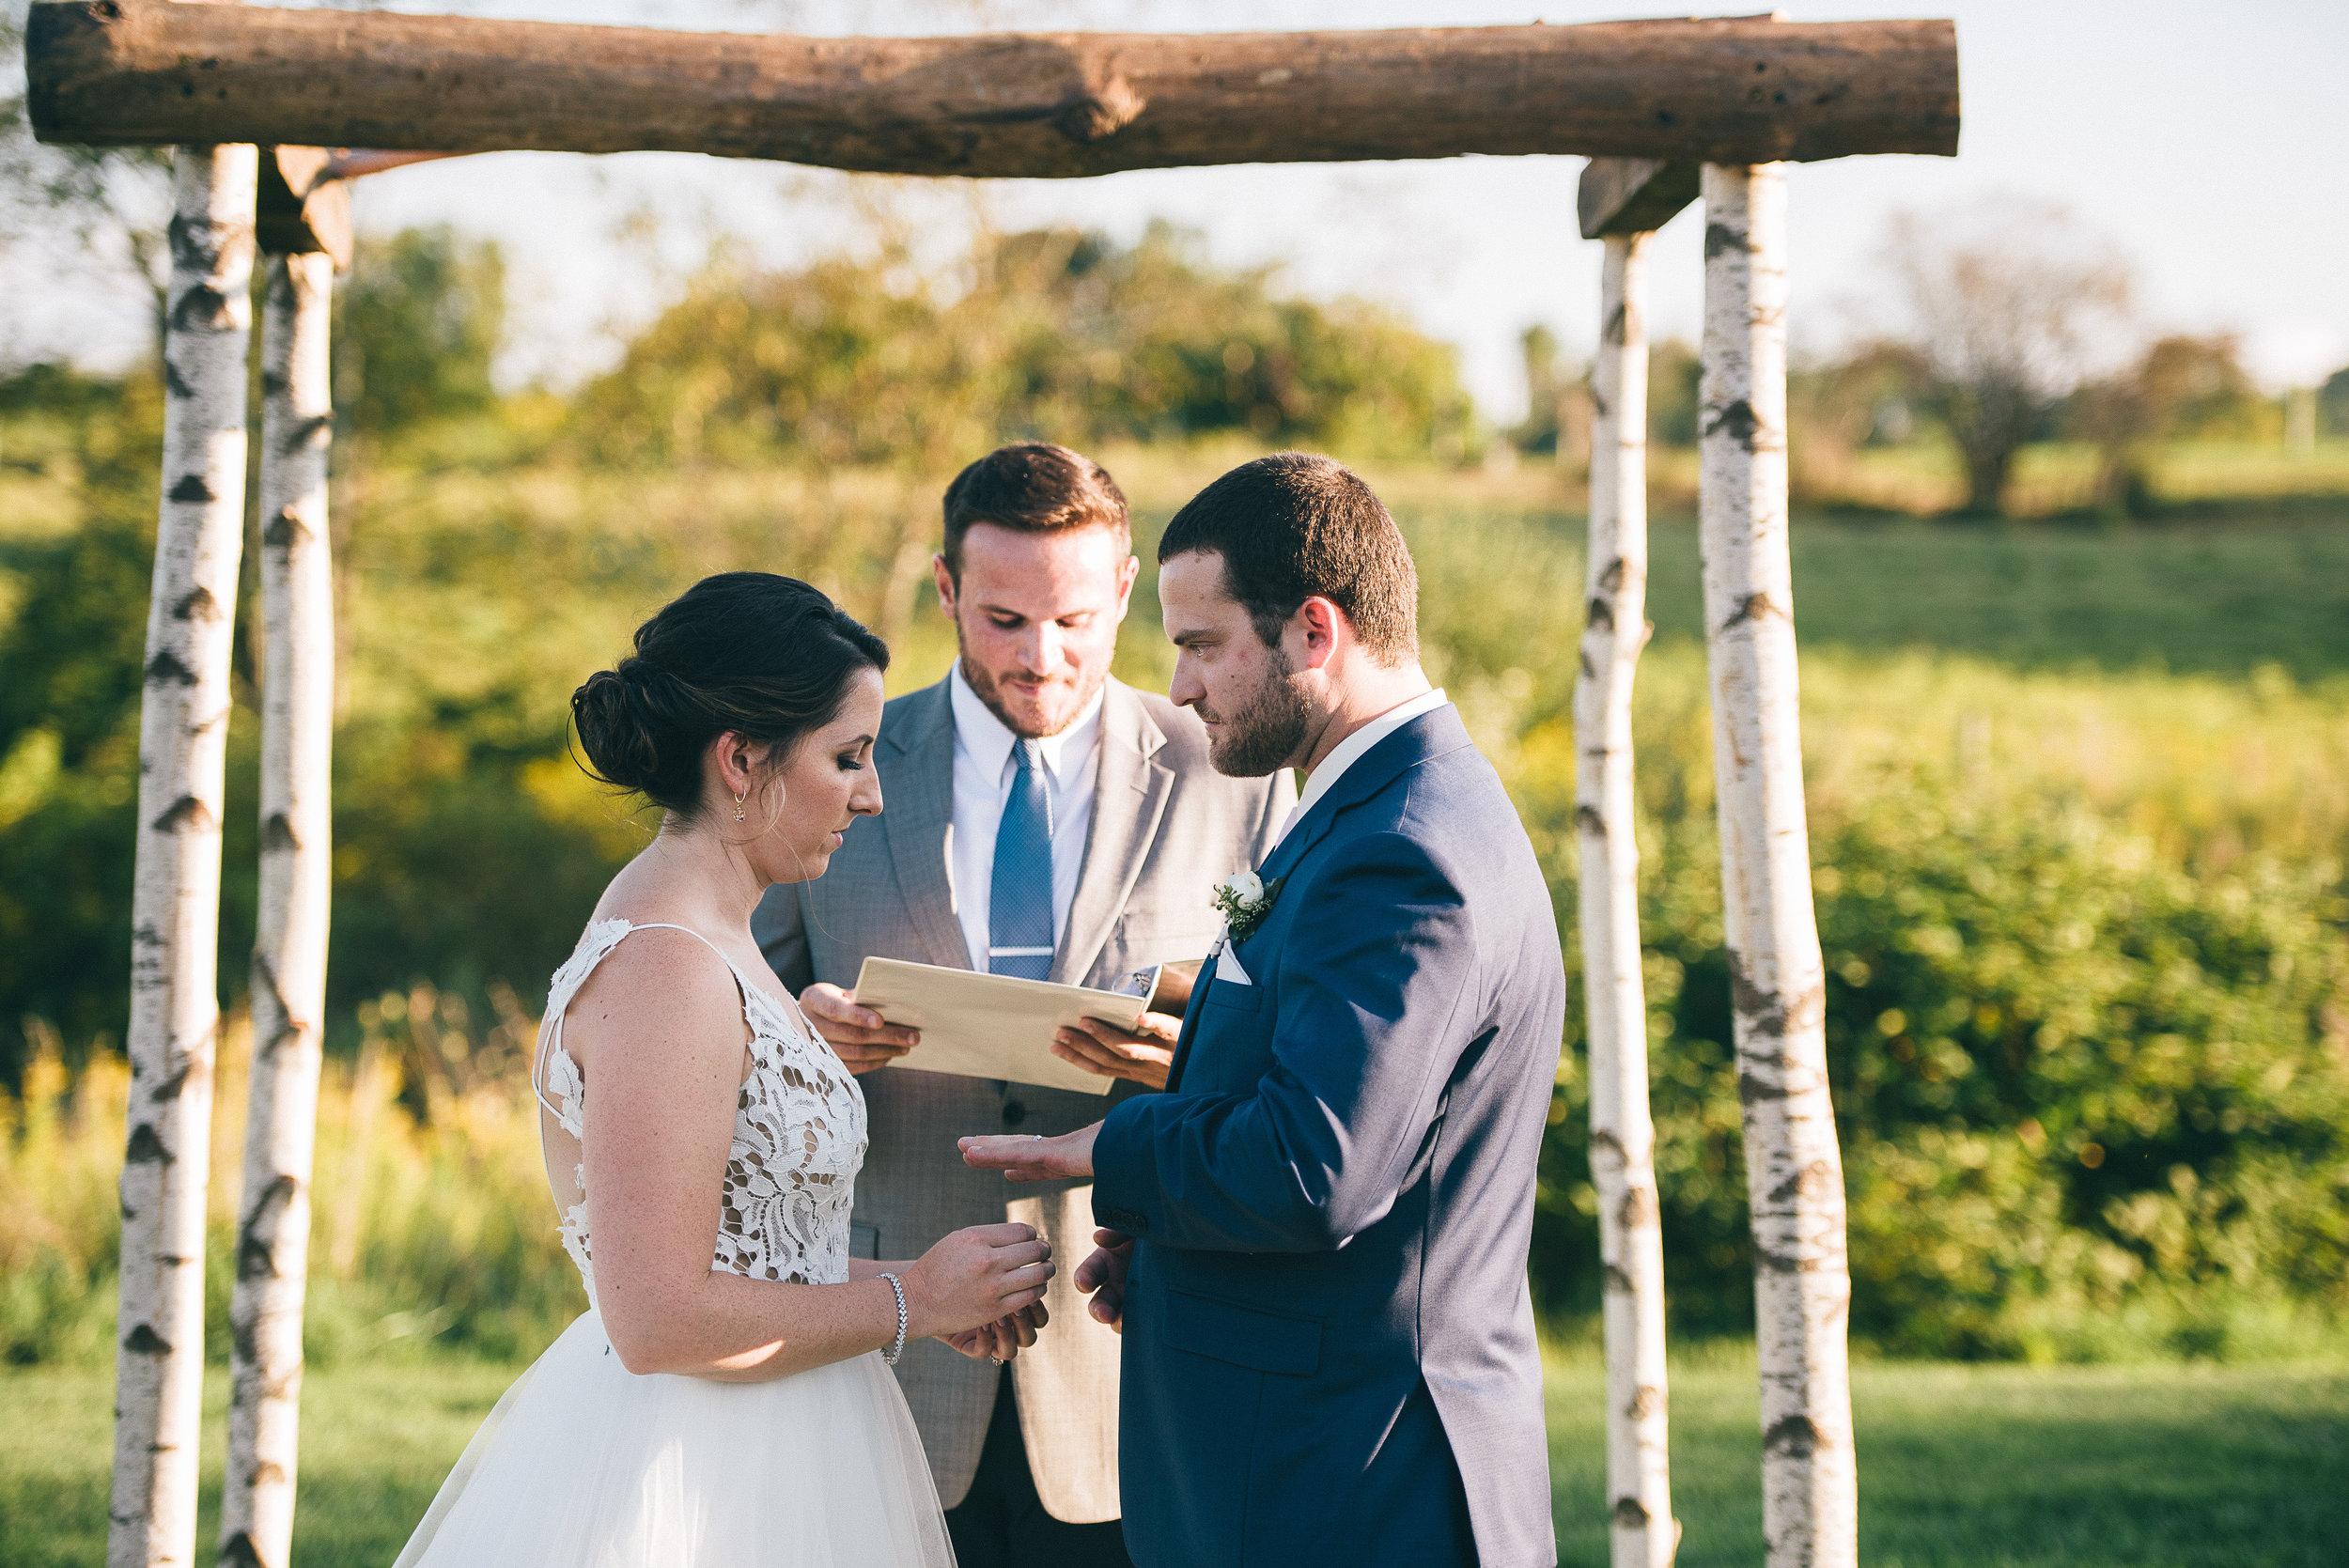 South Farms Wedding Main Line PA Wedding Planner_1-38.JPG